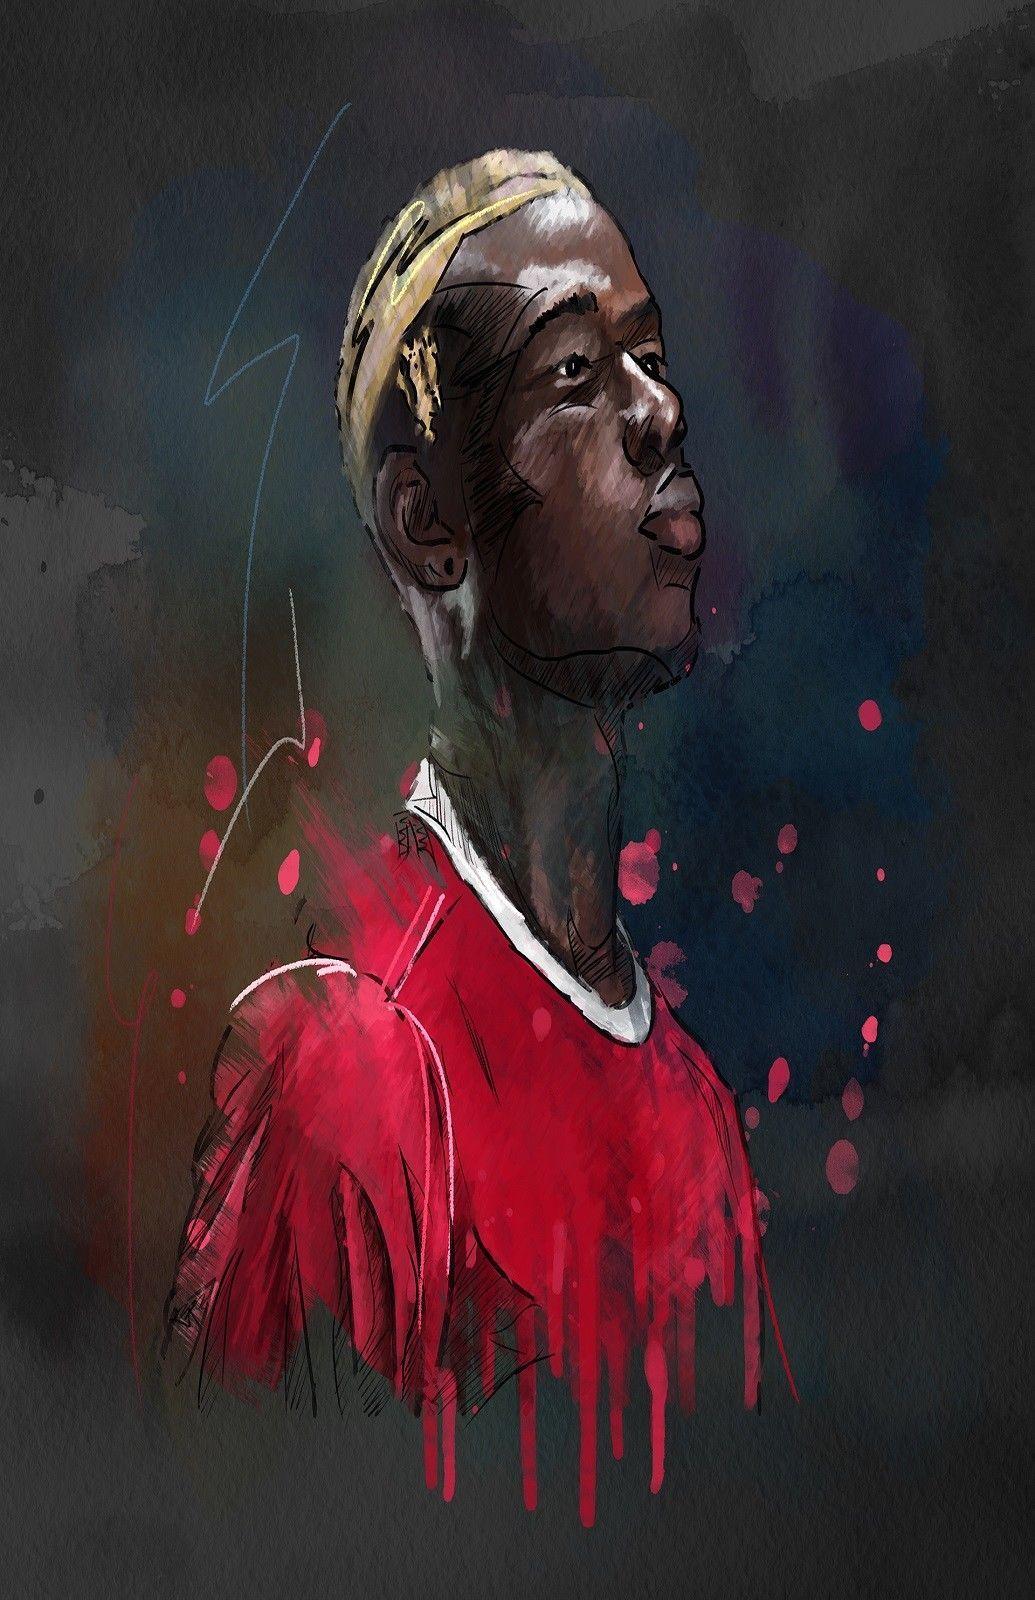 ea09aaf45062a Man United Paul Pogba Football Digital Art Silk Print Poster  24x36inch(60x90cm) 019